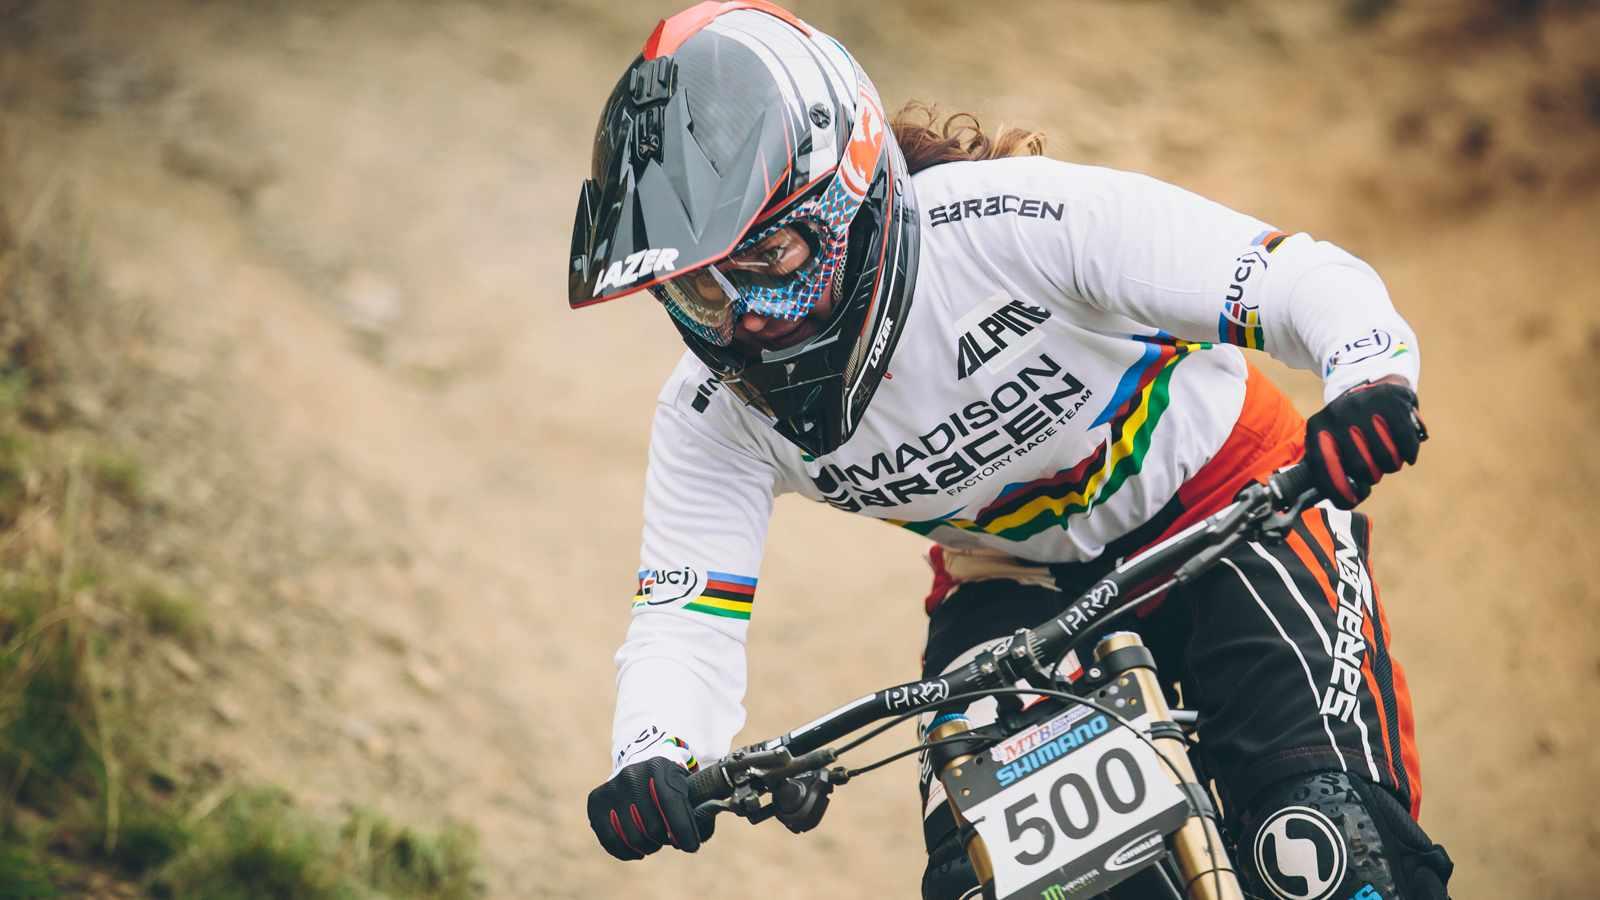 Downhill World Champion Manon Carpenter will take on a more urban challenge this Saturday